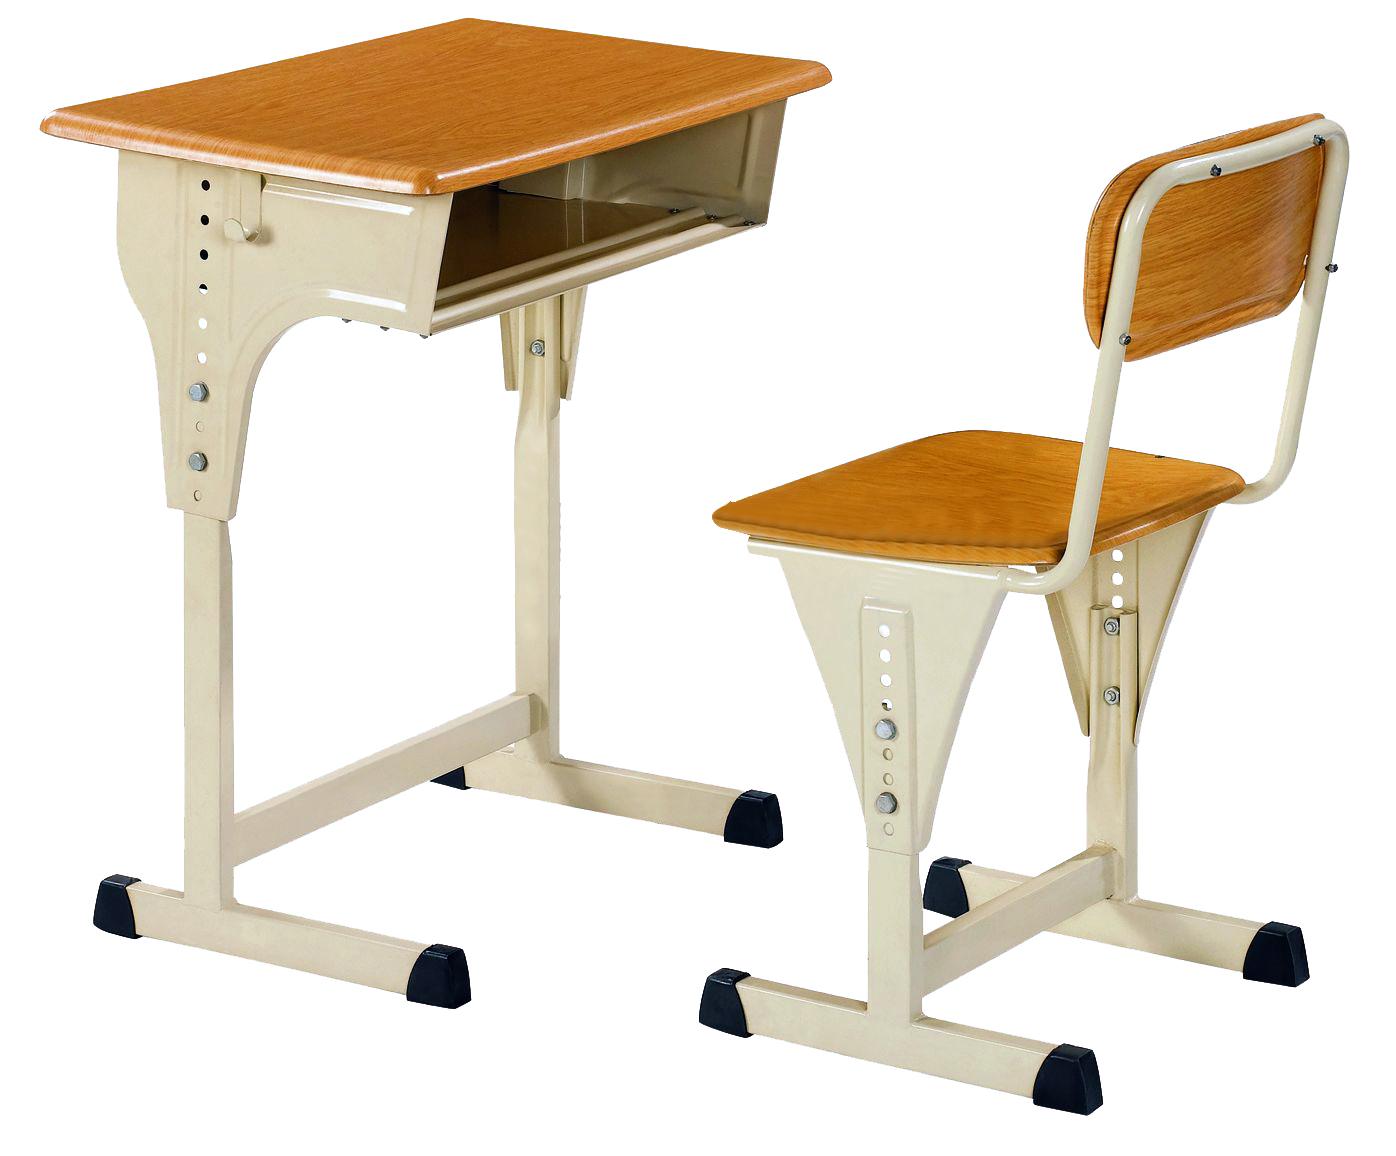 class room furniture in chennai school furniture in chennai. Black Bedroom Furniture Sets. Home Design Ideas